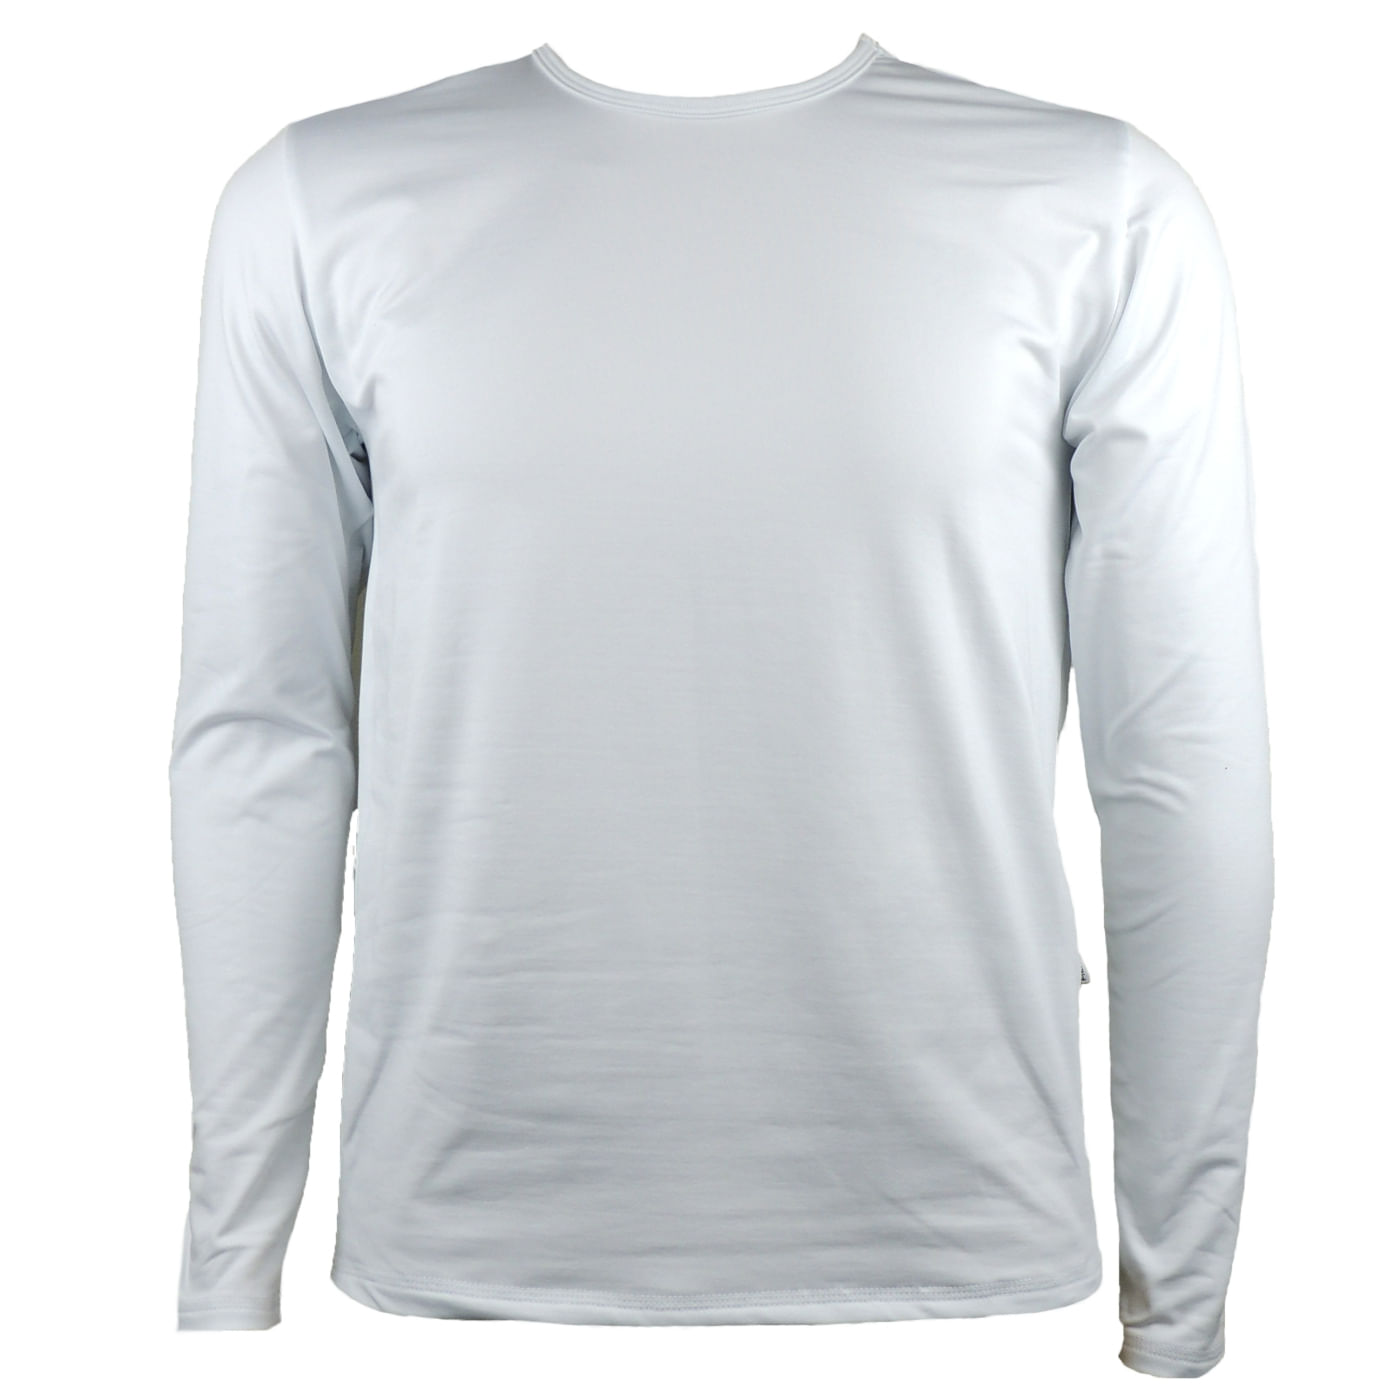 e9855b3d29 Blusa Térmica Masculina na Cor Branca